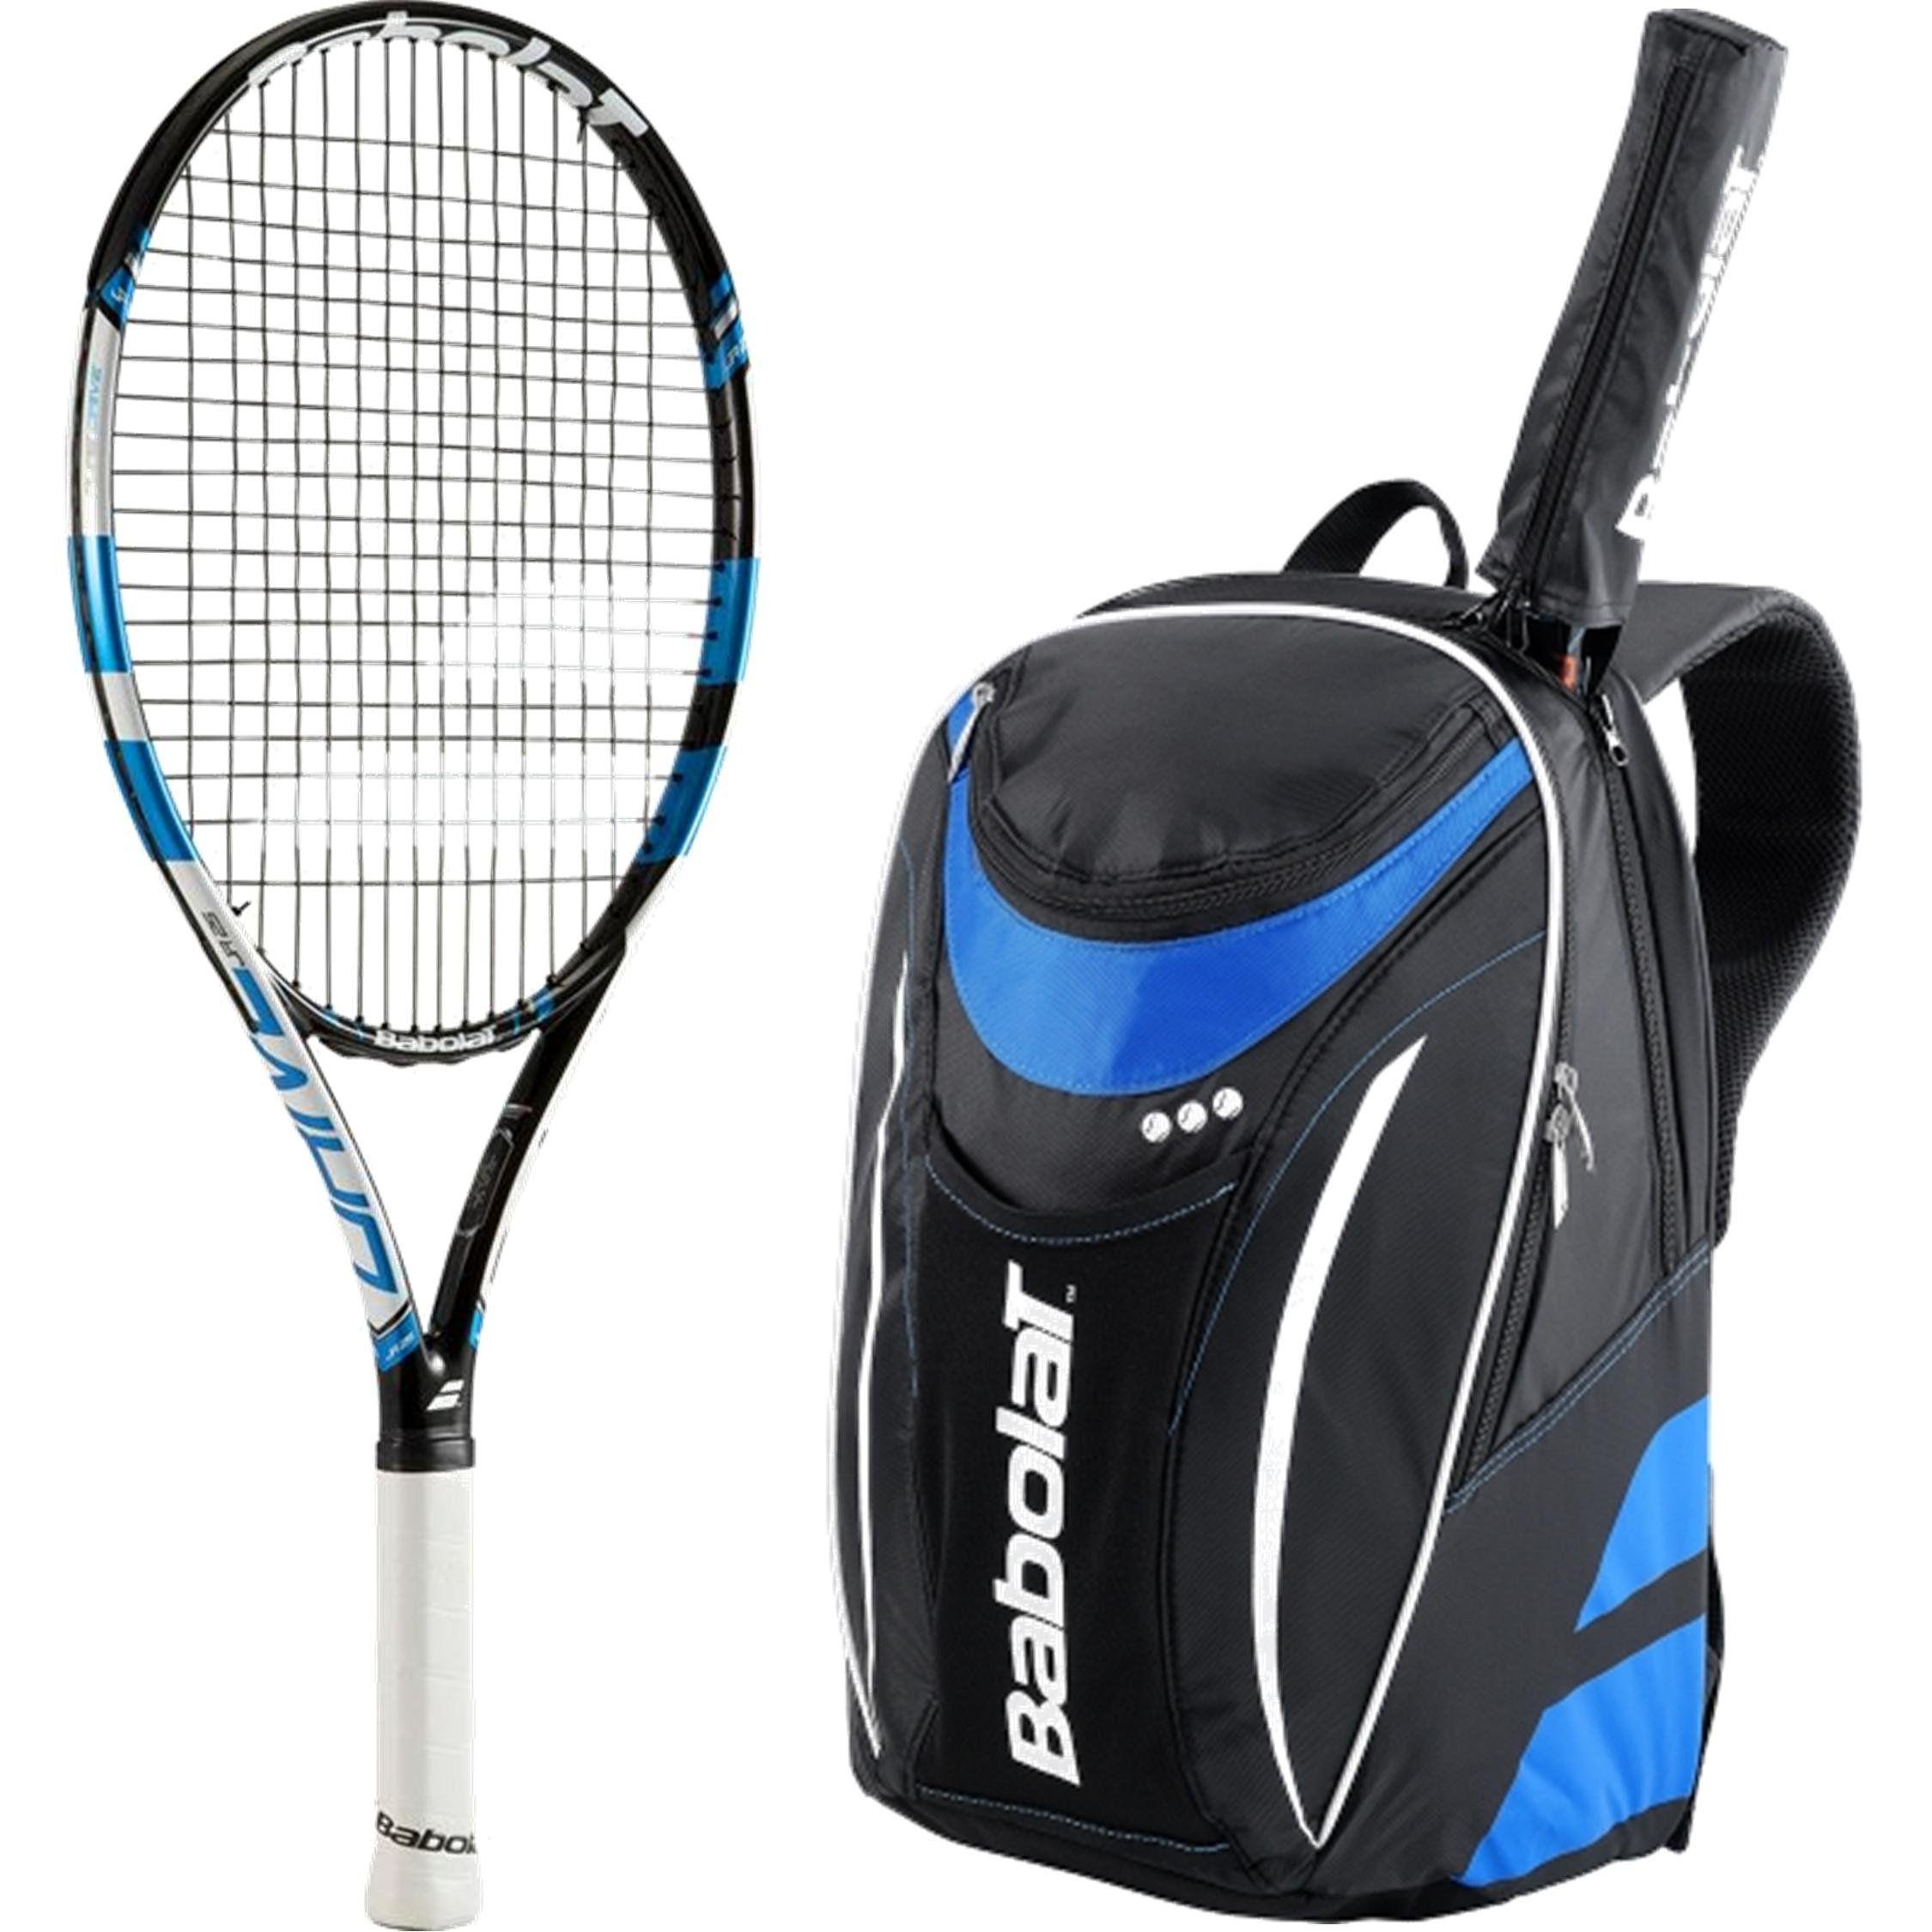 Babolat Pure Drive Junior 25 Tennis Racquet Blue Black White Bundled With Club Line Tennis Backpack Blue Black Tennis Backpack Blue Backpack Tennis Racquet